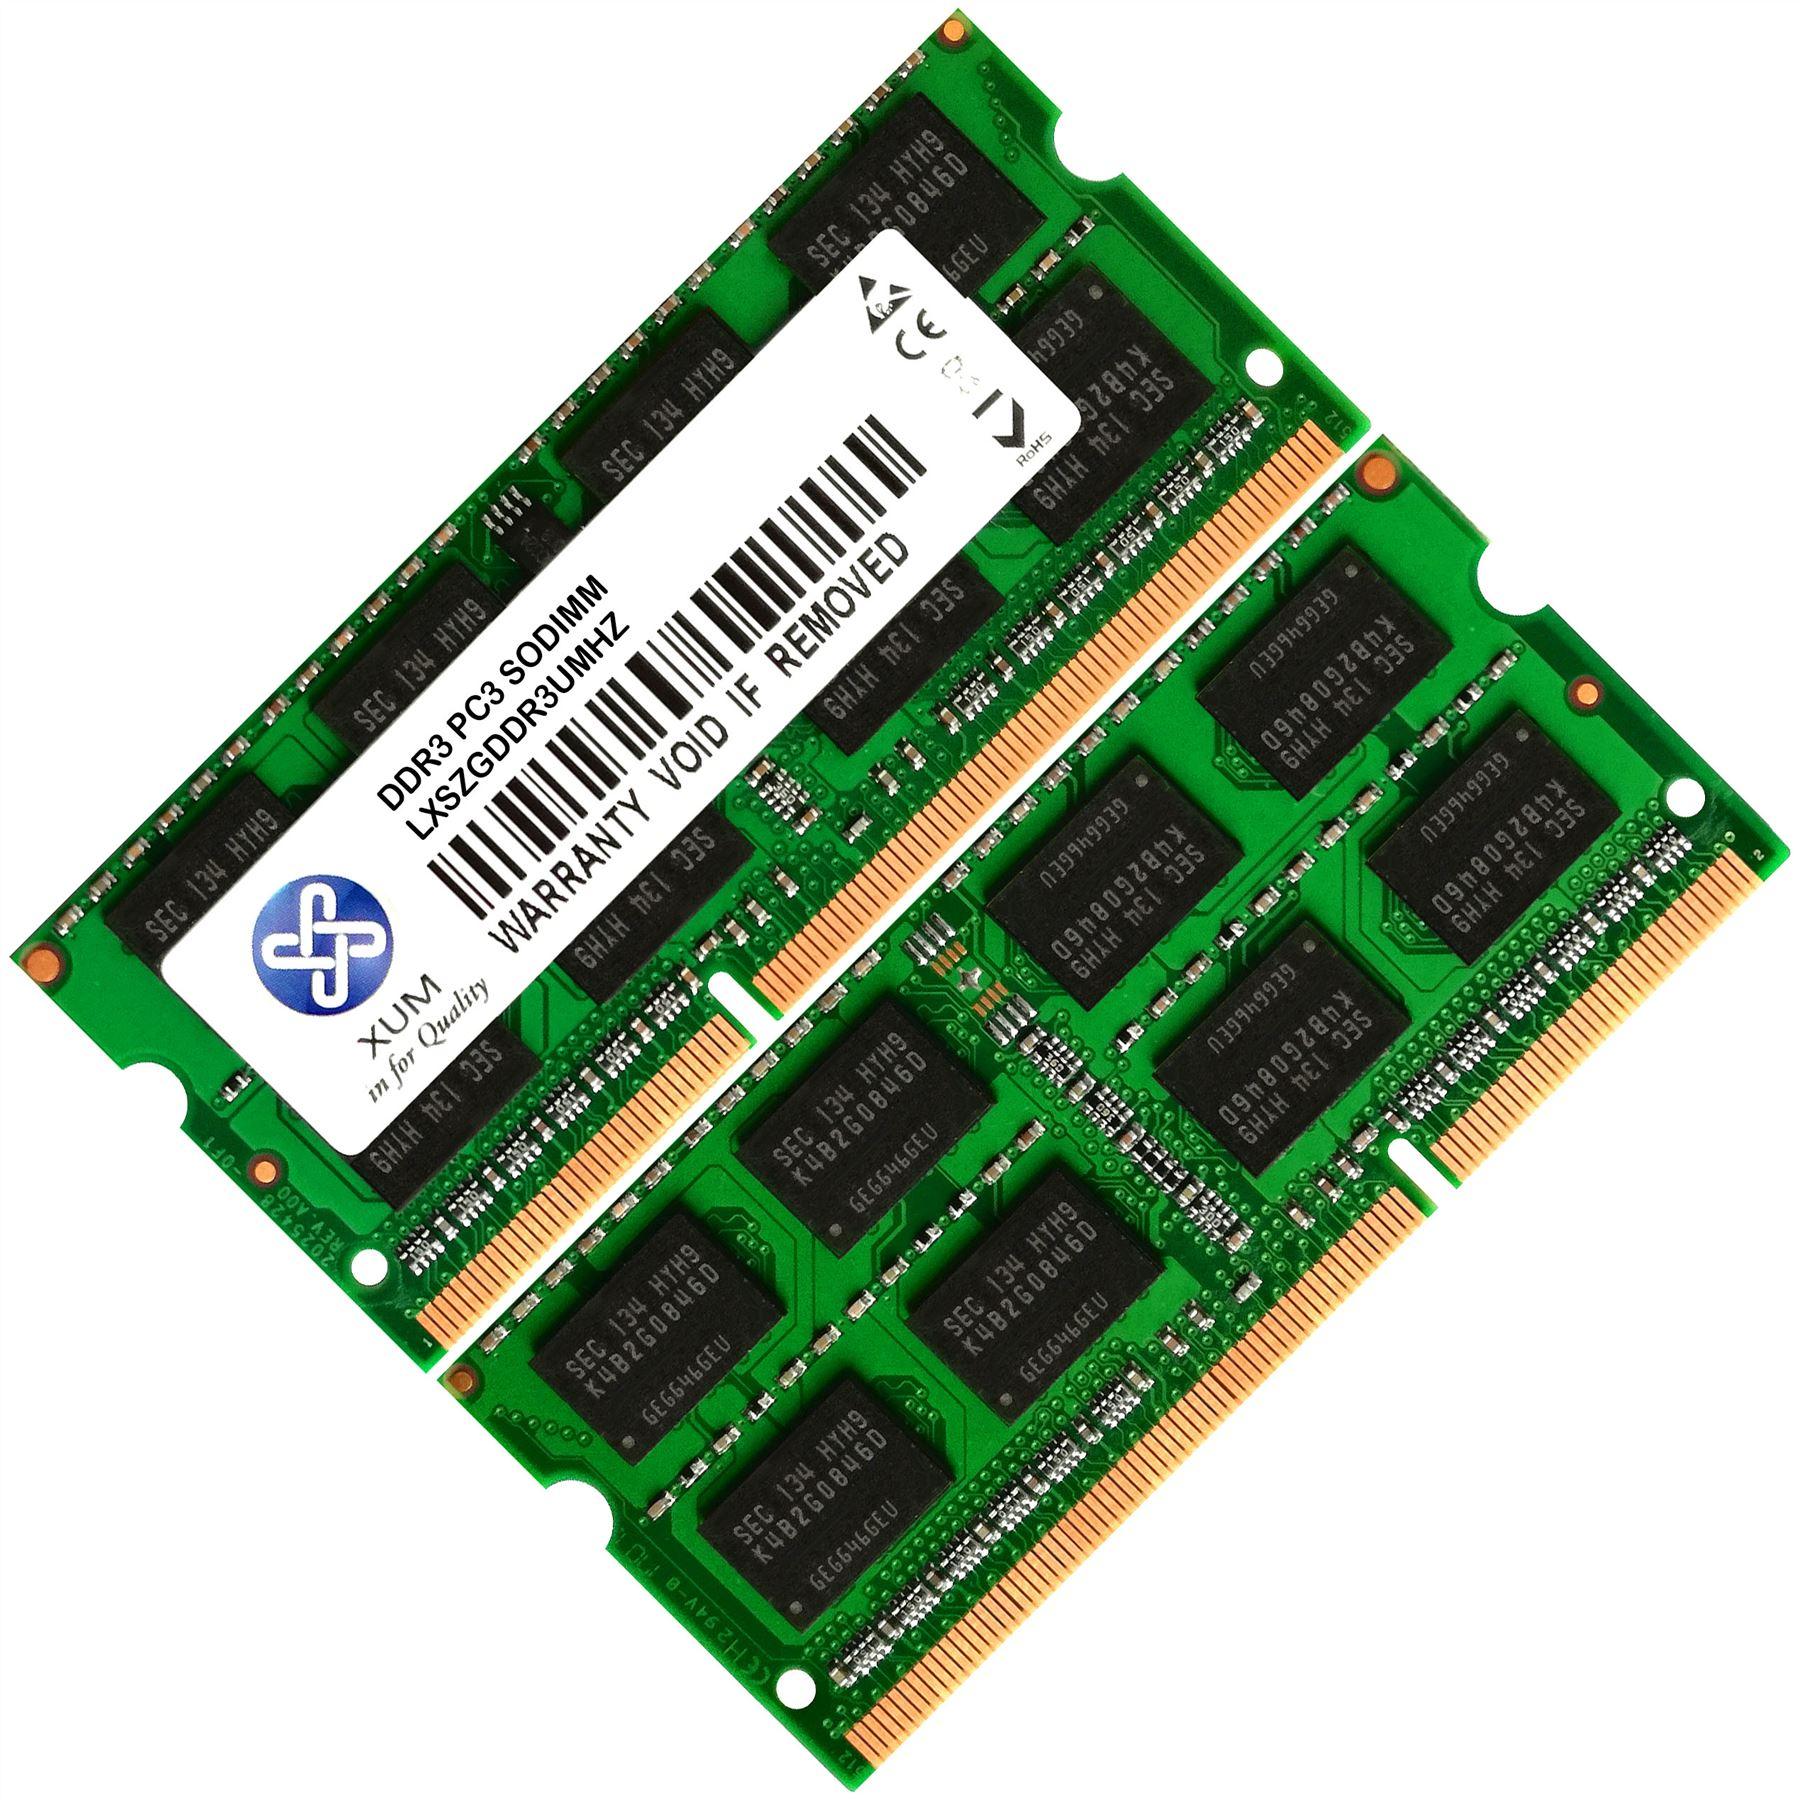 Memoria-Ram-4-Toshiba-Satellite-Pro-Laptop-U500-1E5-U500-1E6-Nuevo-2x-Lot